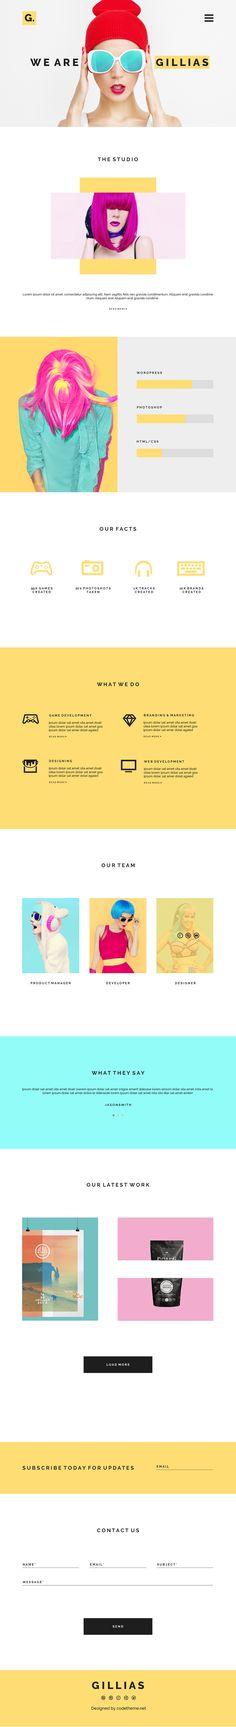 Gillias an Agency Web Design on Behance